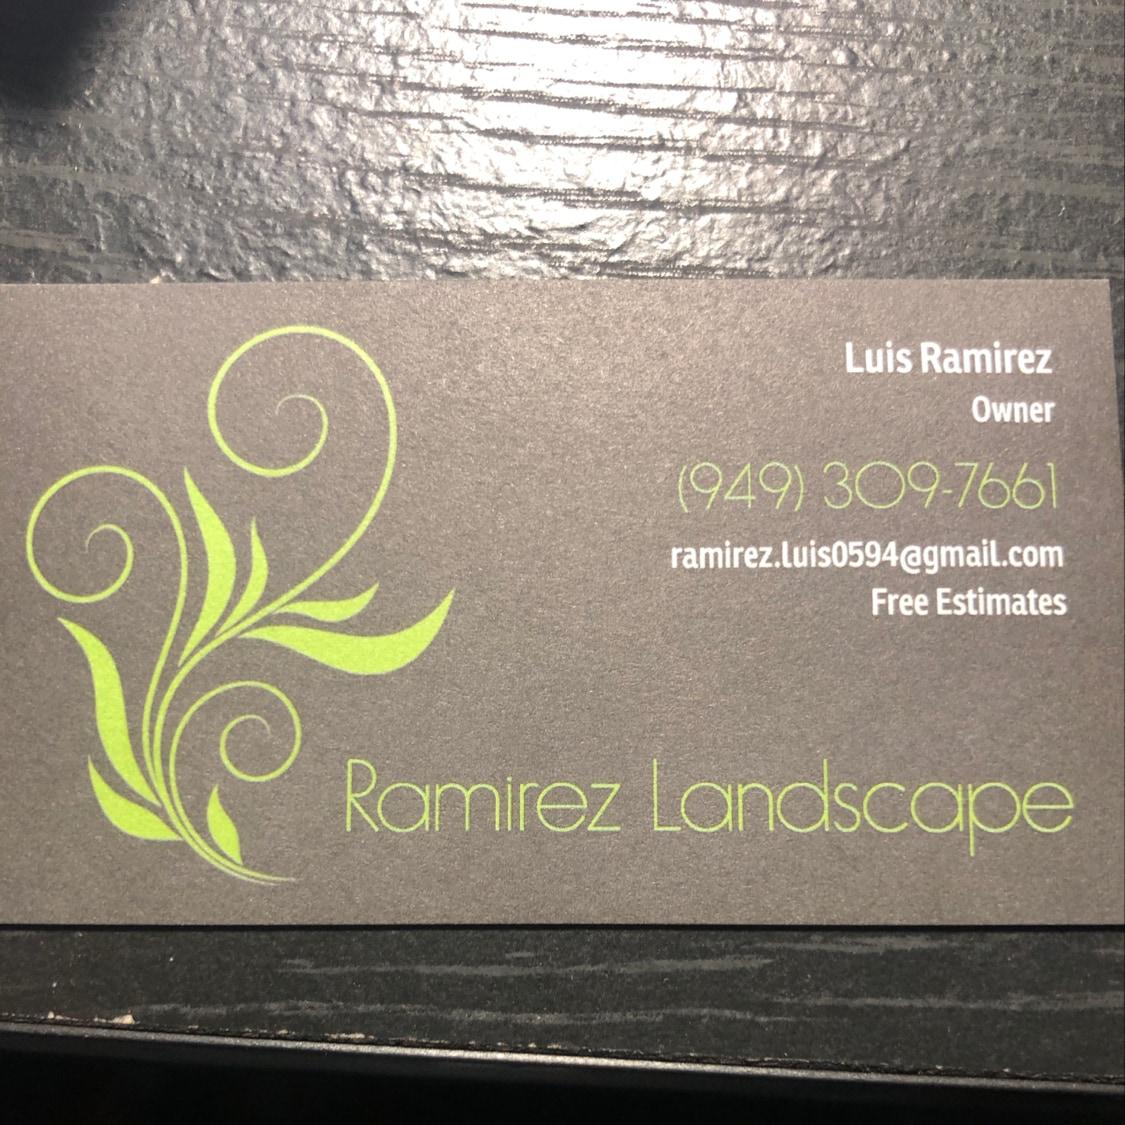 Ramirez Landscape